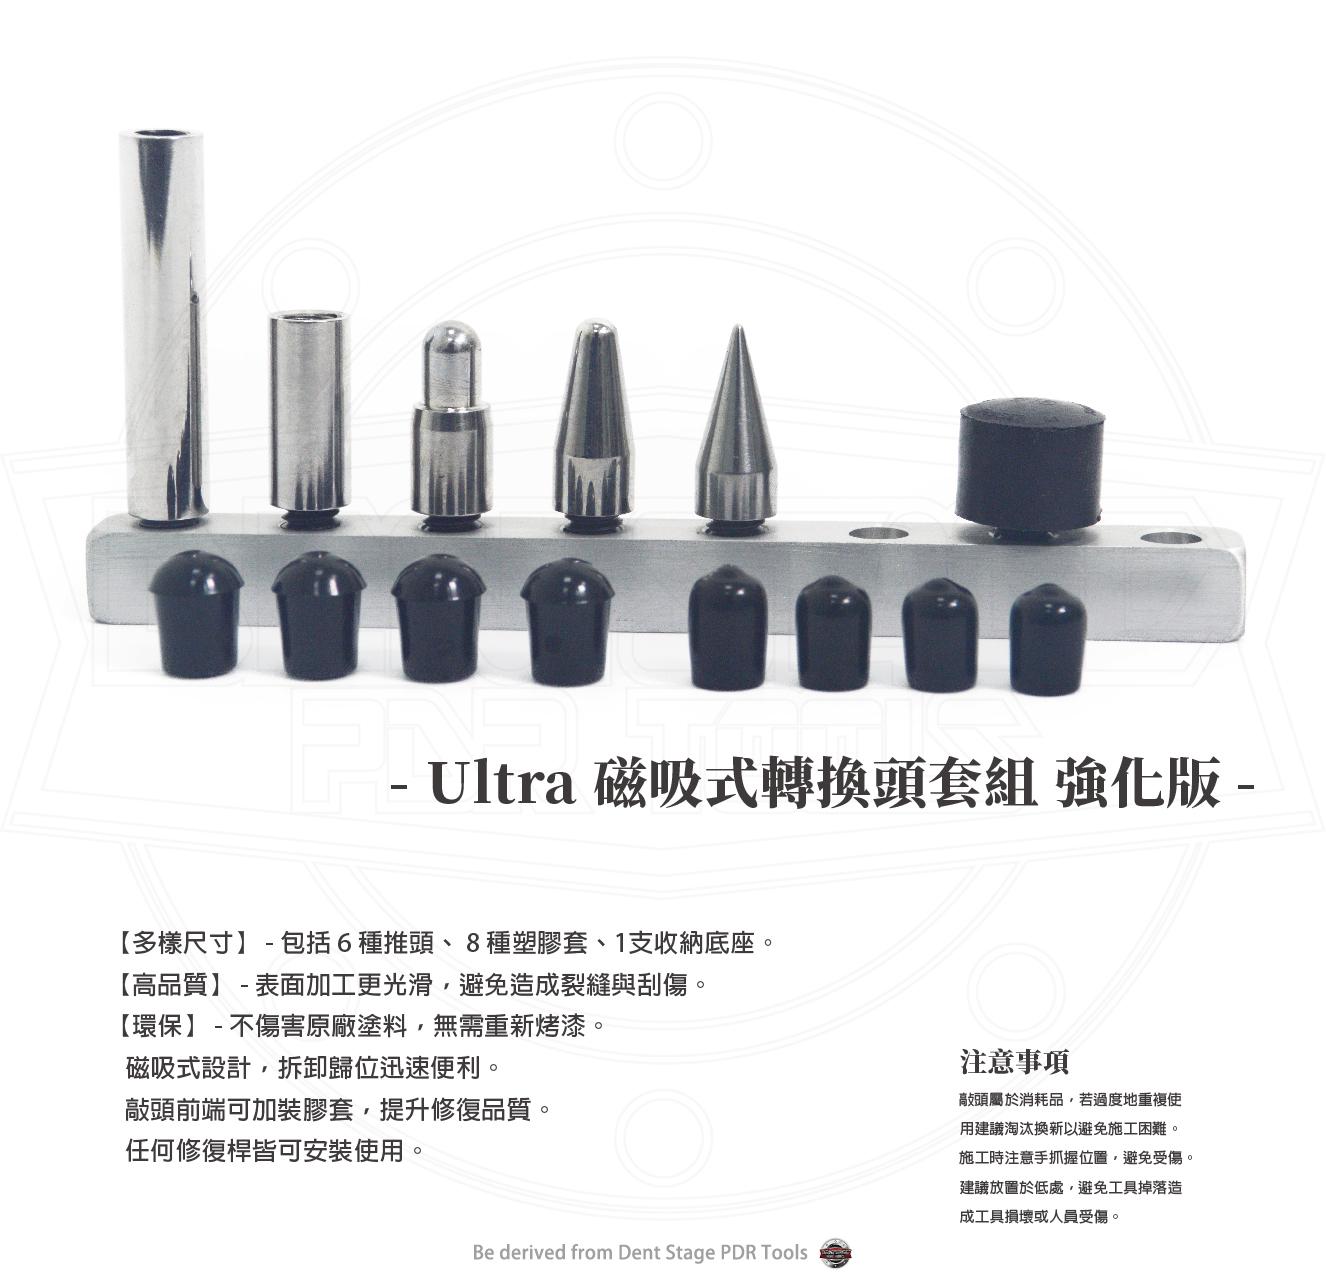 Ultra 磁吸式轉換頭套組 - 1.3cm管徑_02.jpg